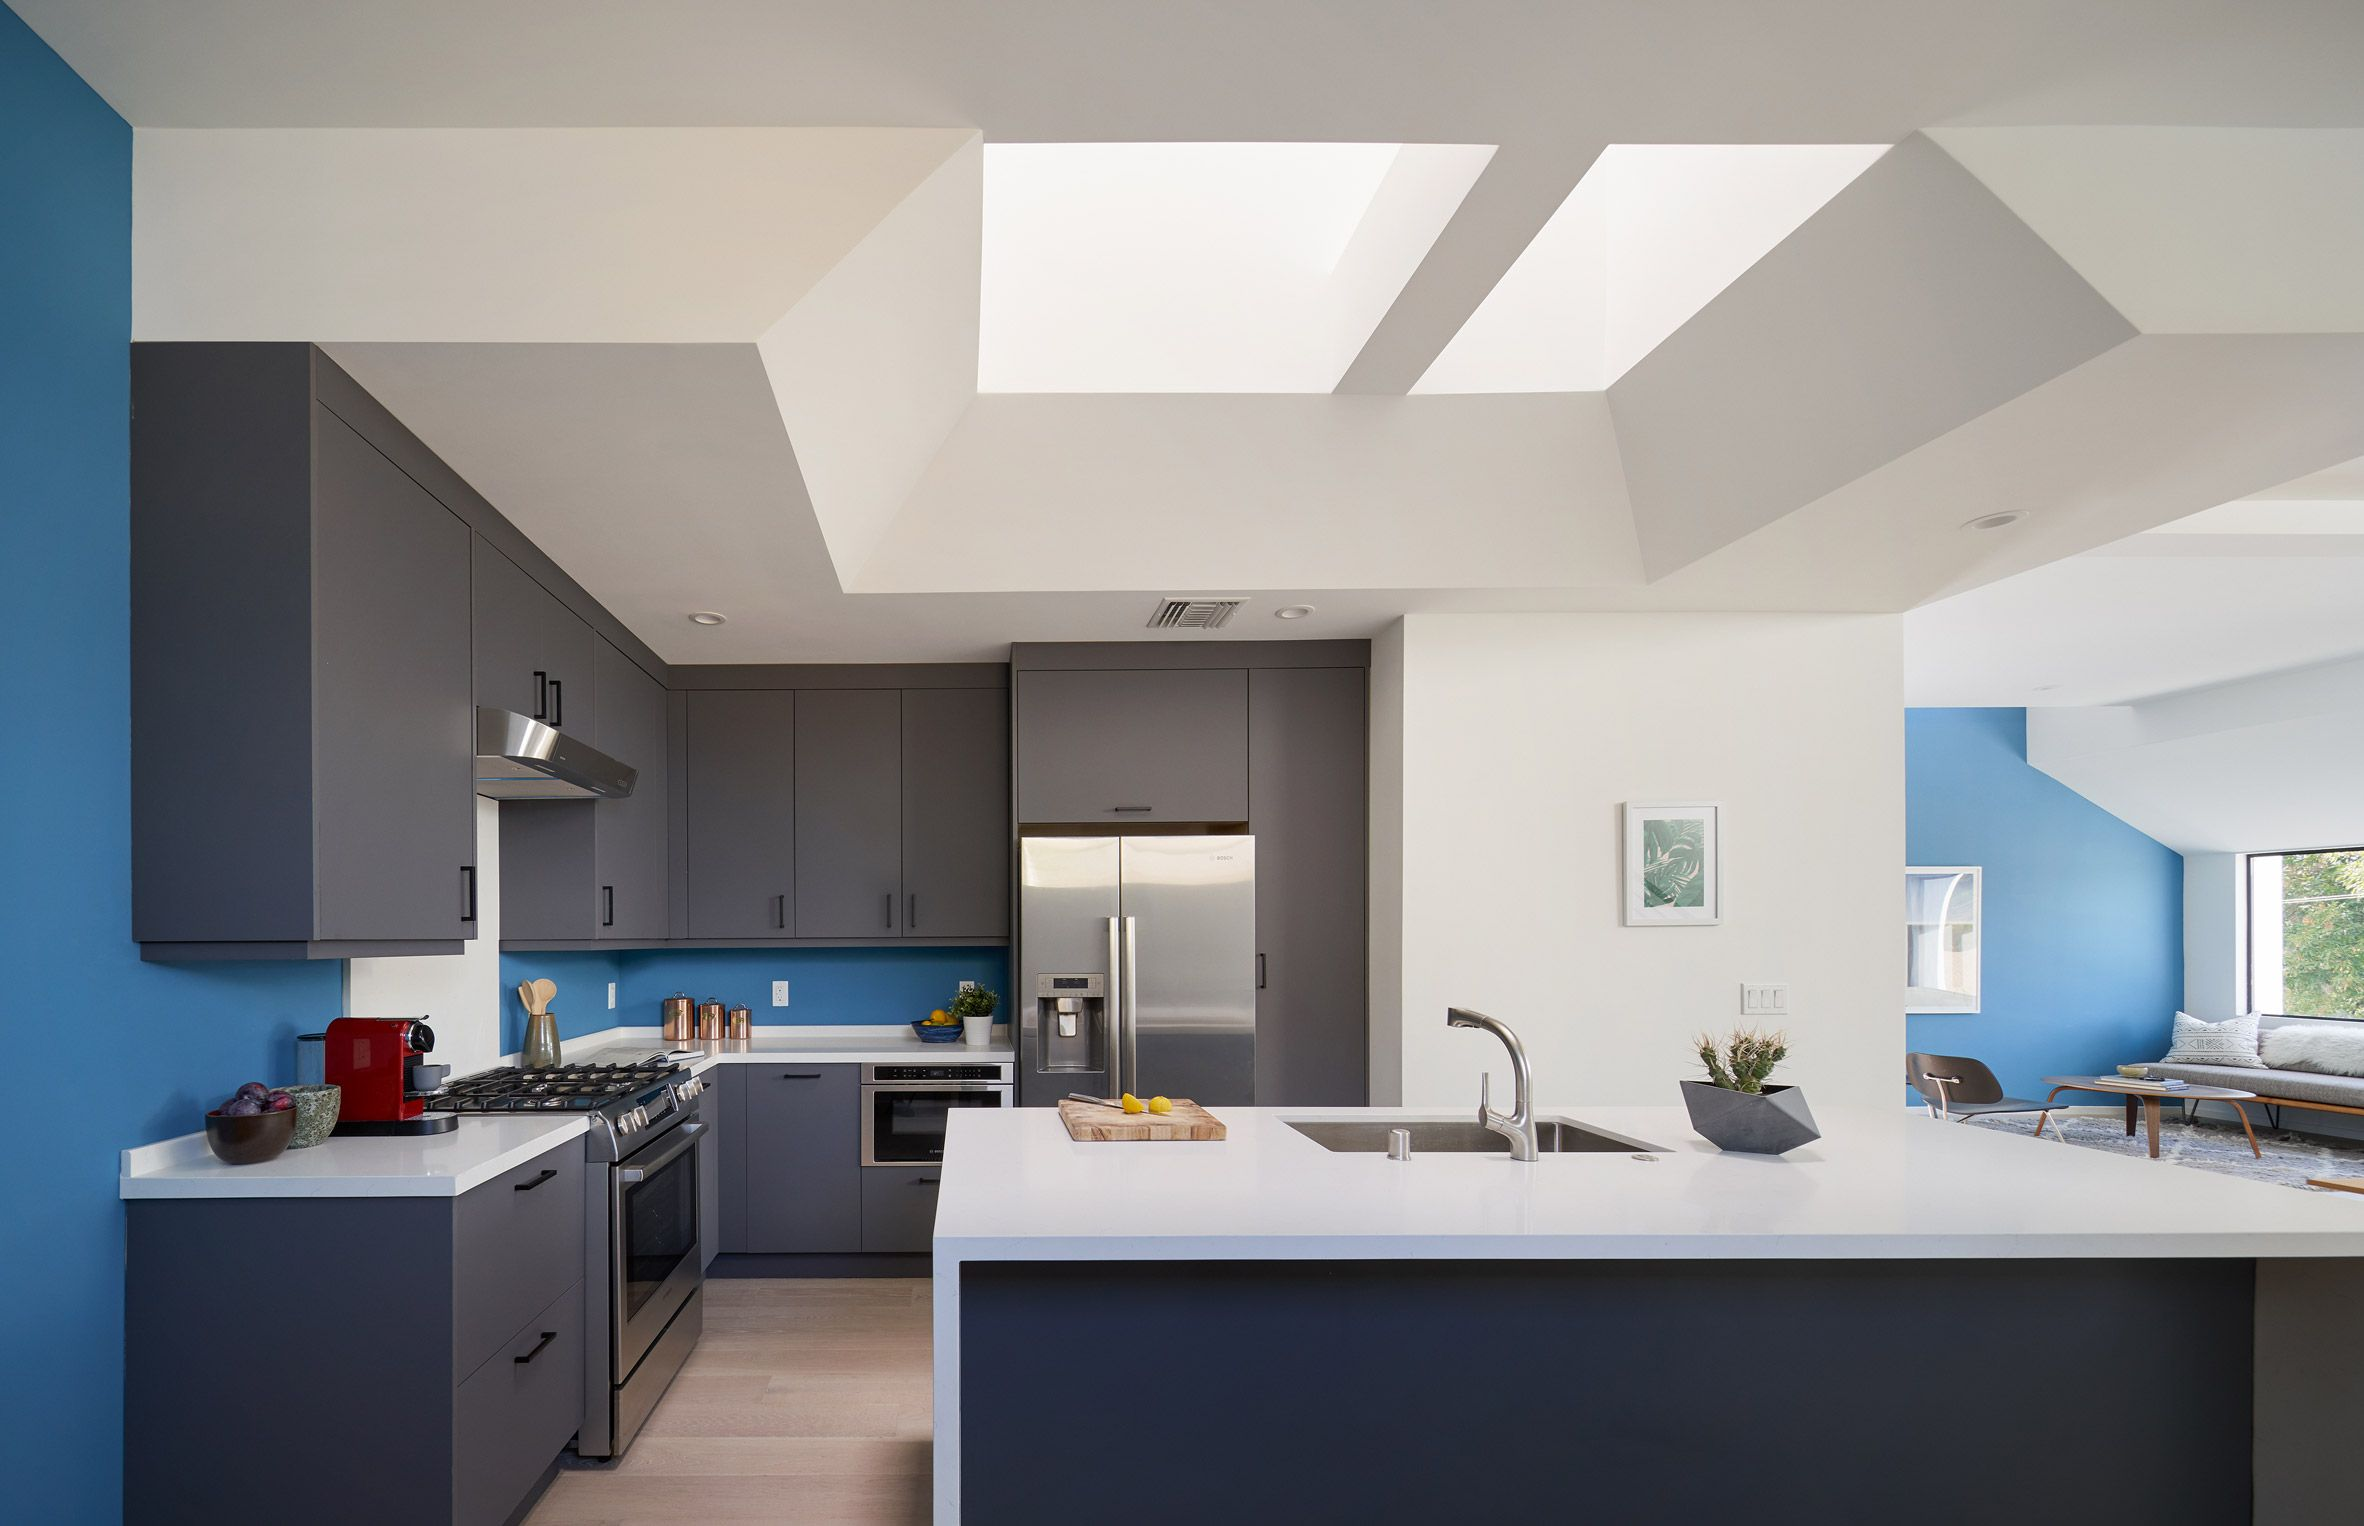 G geformte küchenideen  east baltimore street by urban operations  interiors in